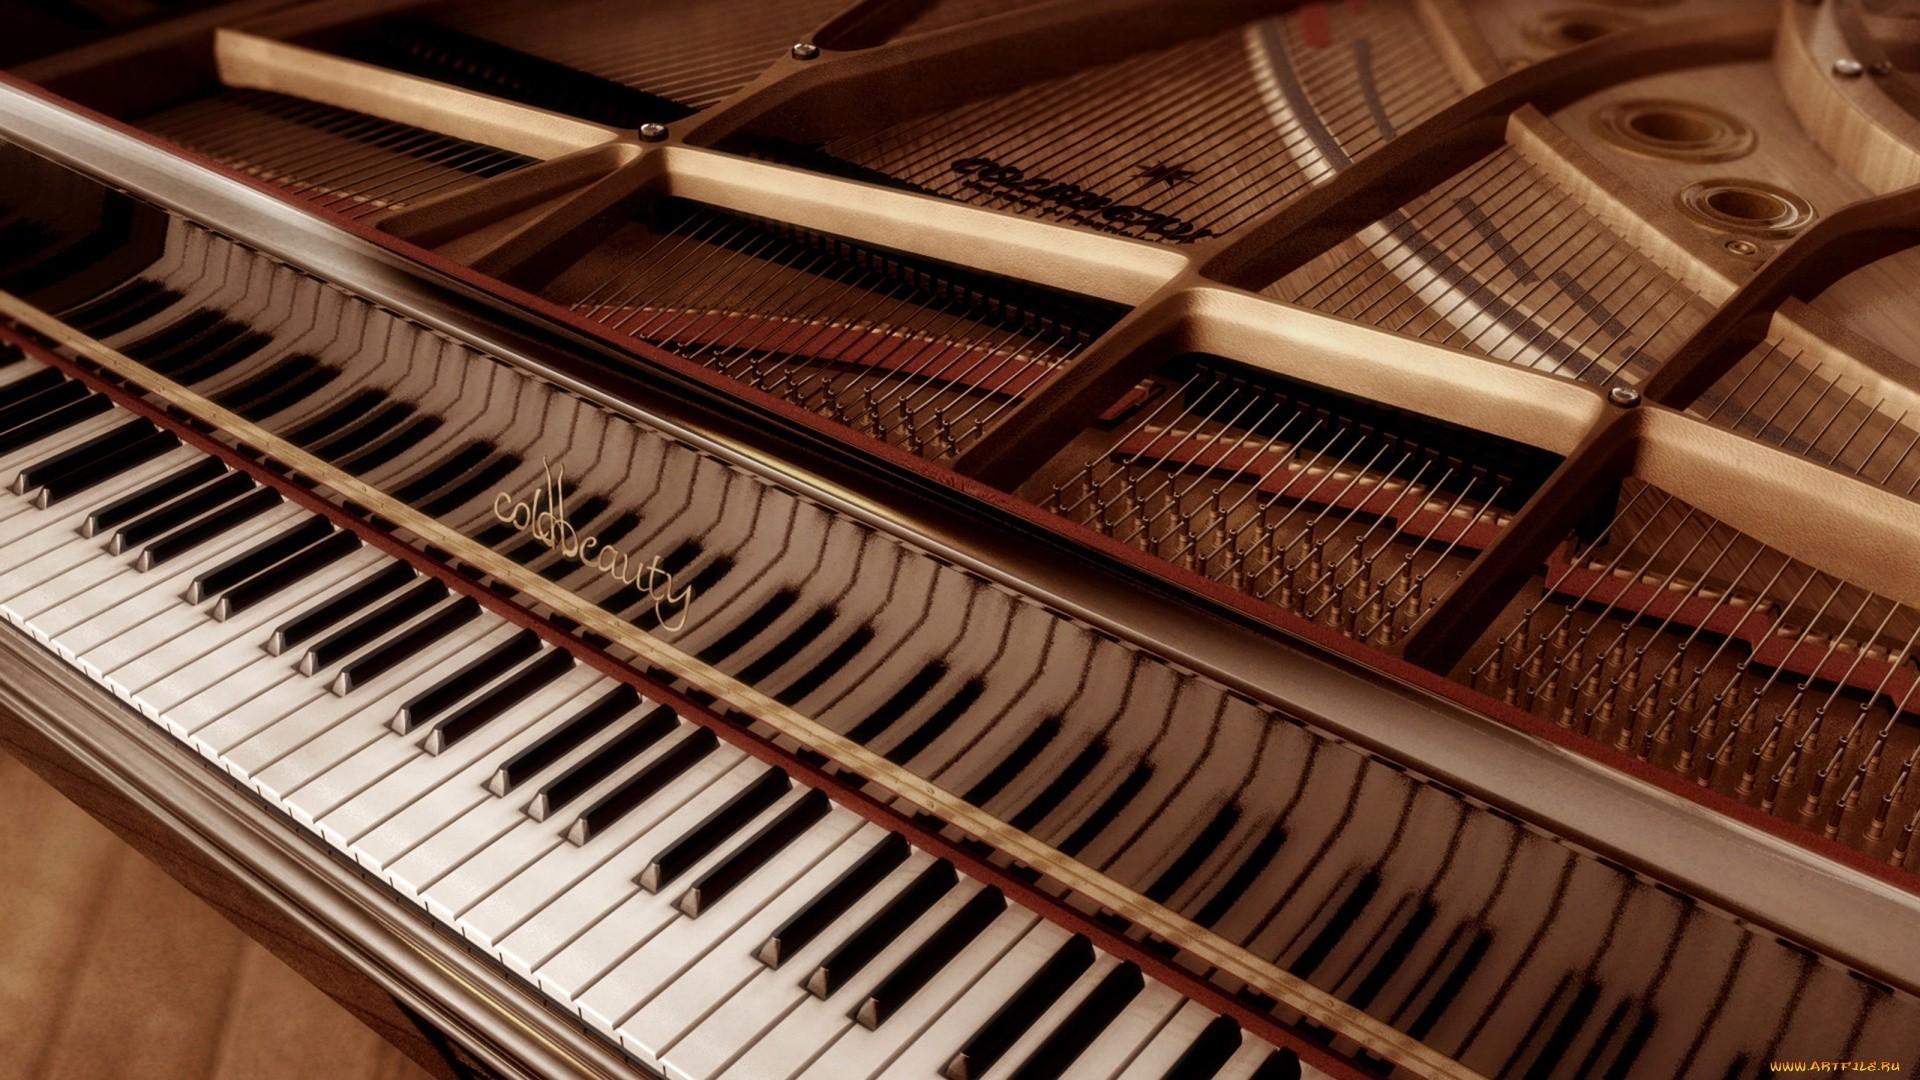 Piano computer wallpaper